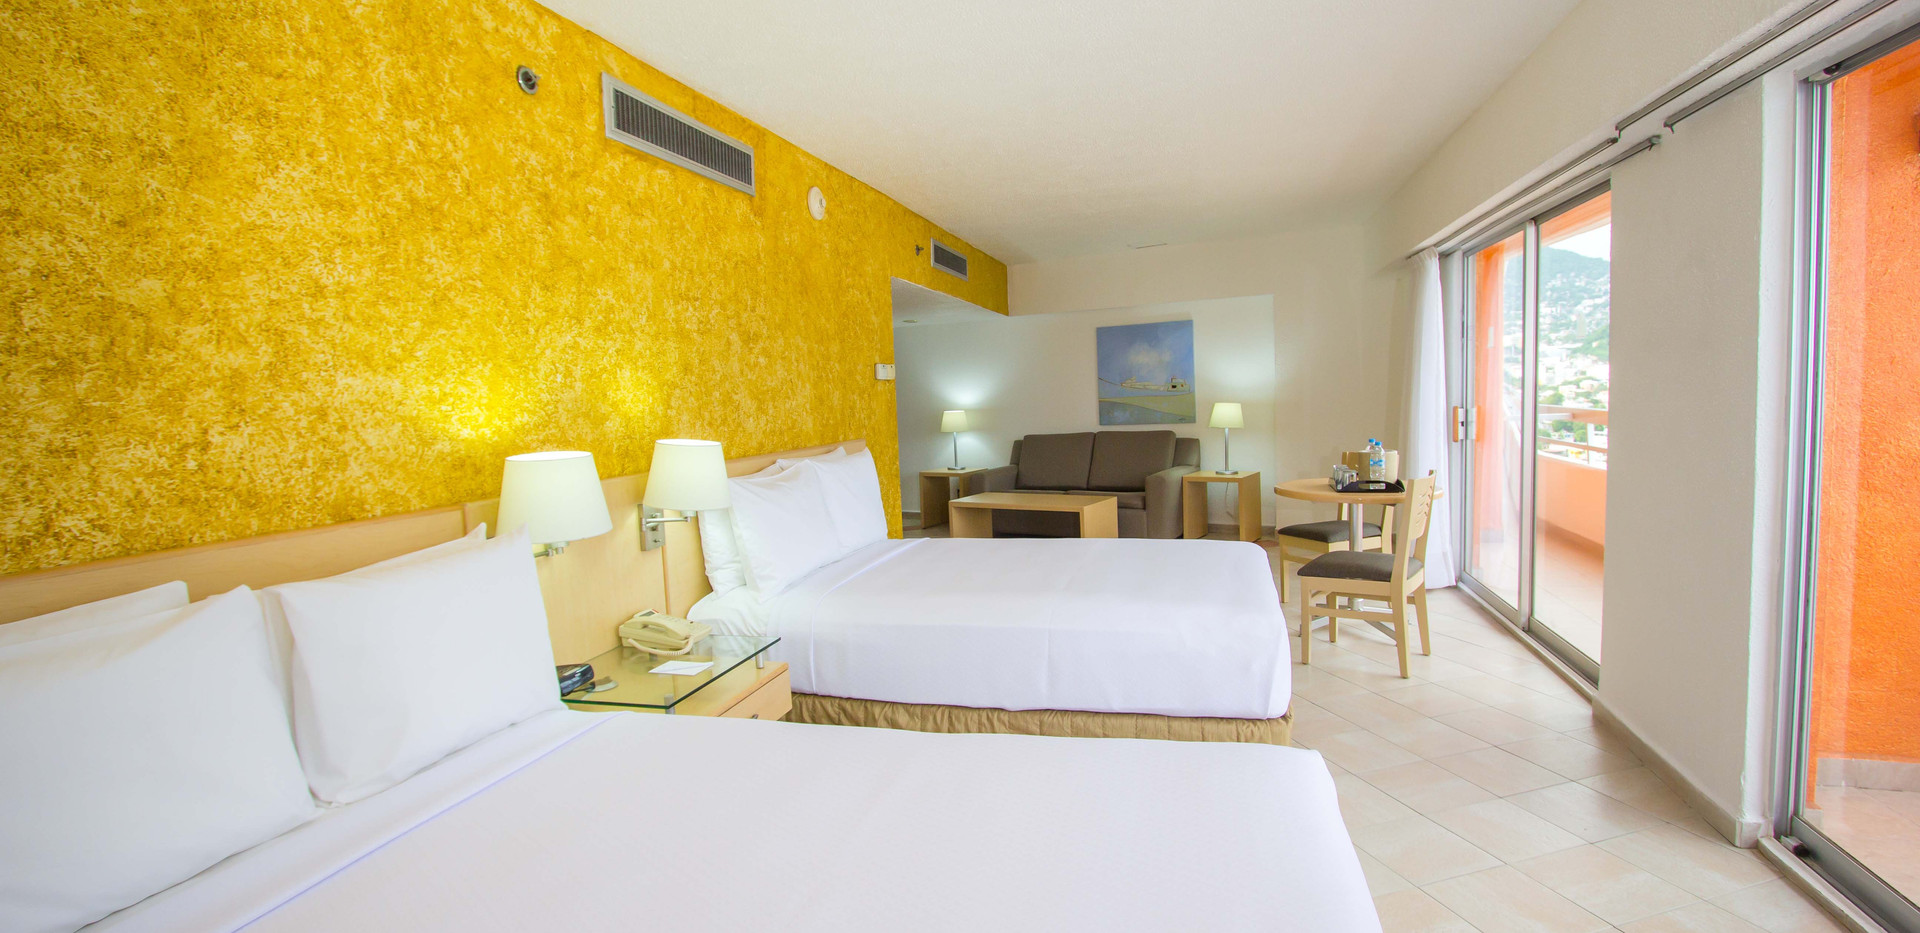 HS_HOTSSON_Smart_Acapulco_Double_Room_Su